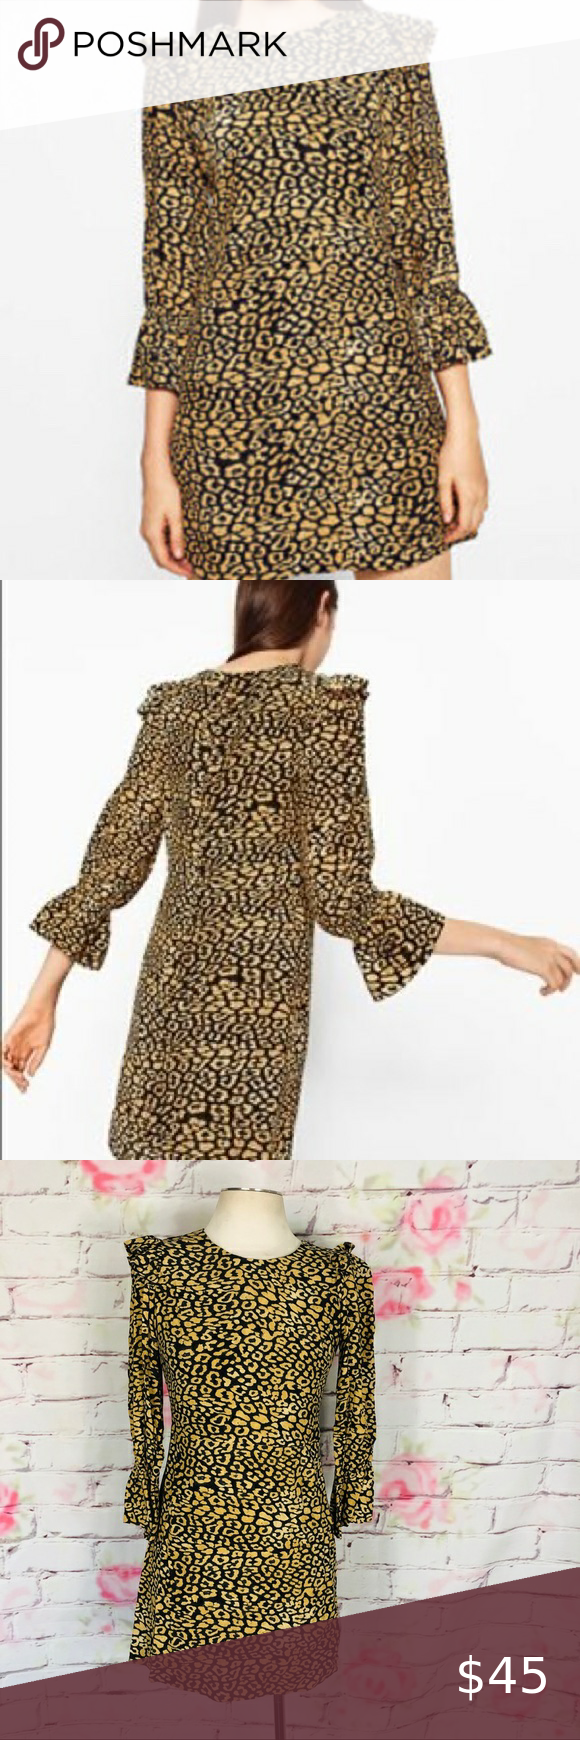 Zara Long Sleeve Ruffle Leopard Cheetah Print Dres Clothes Design Fashion Print Clothes [ 1740 x 580 Pixel ]